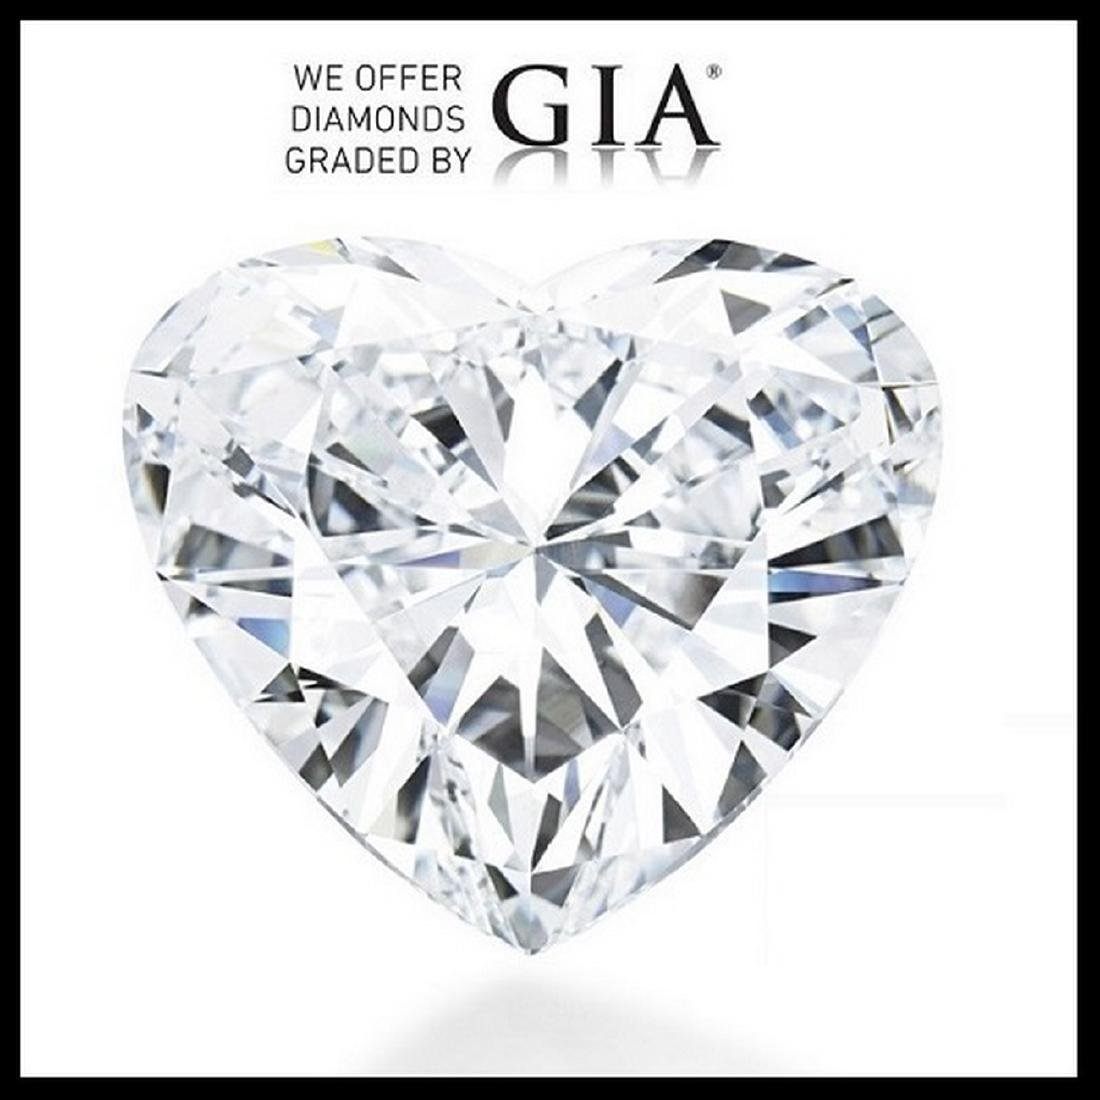 5.01 ct, Color F/VVS2, Heart cut Diamond